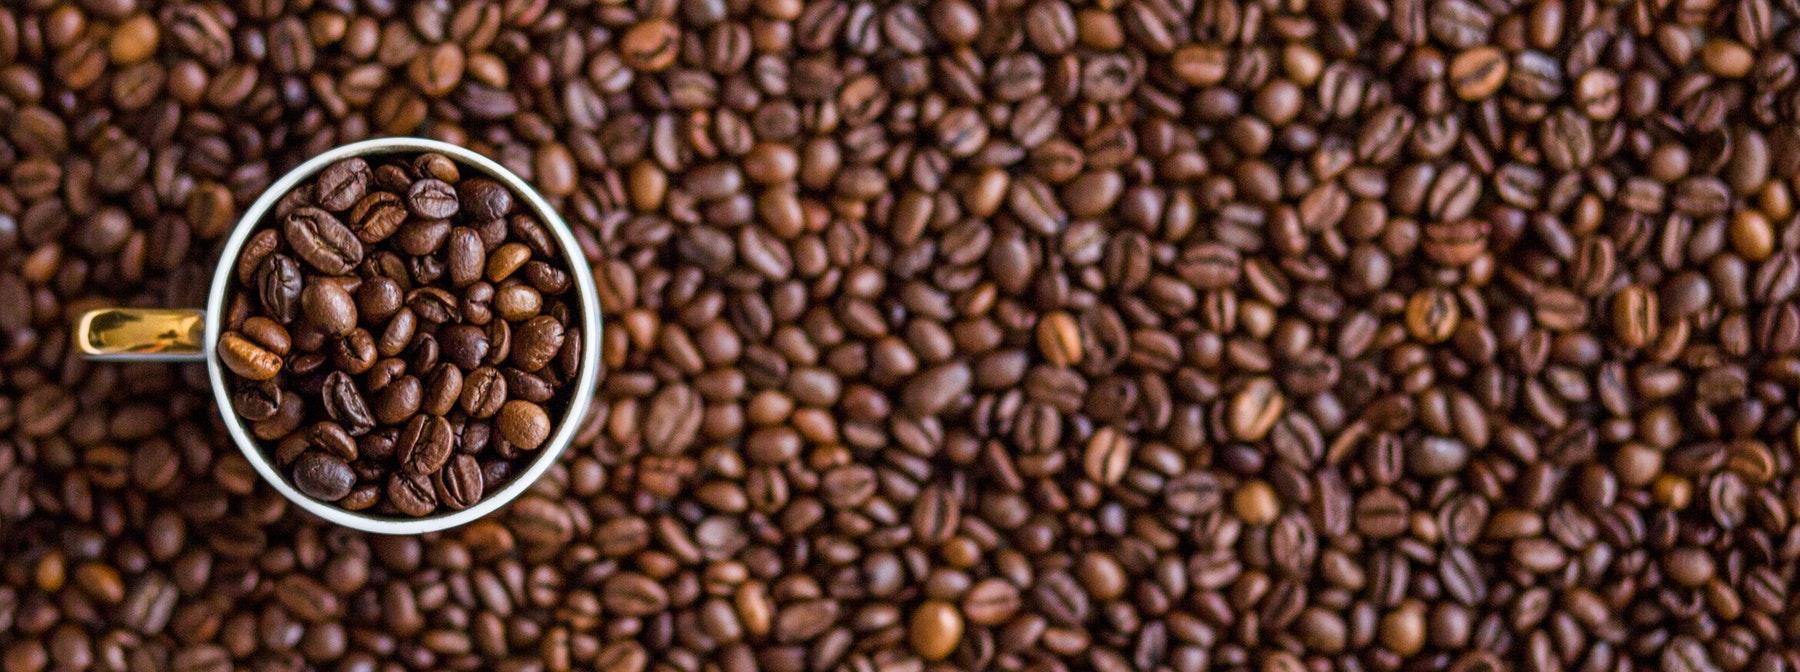 coffee-beans_top-5-best-coffee-machines